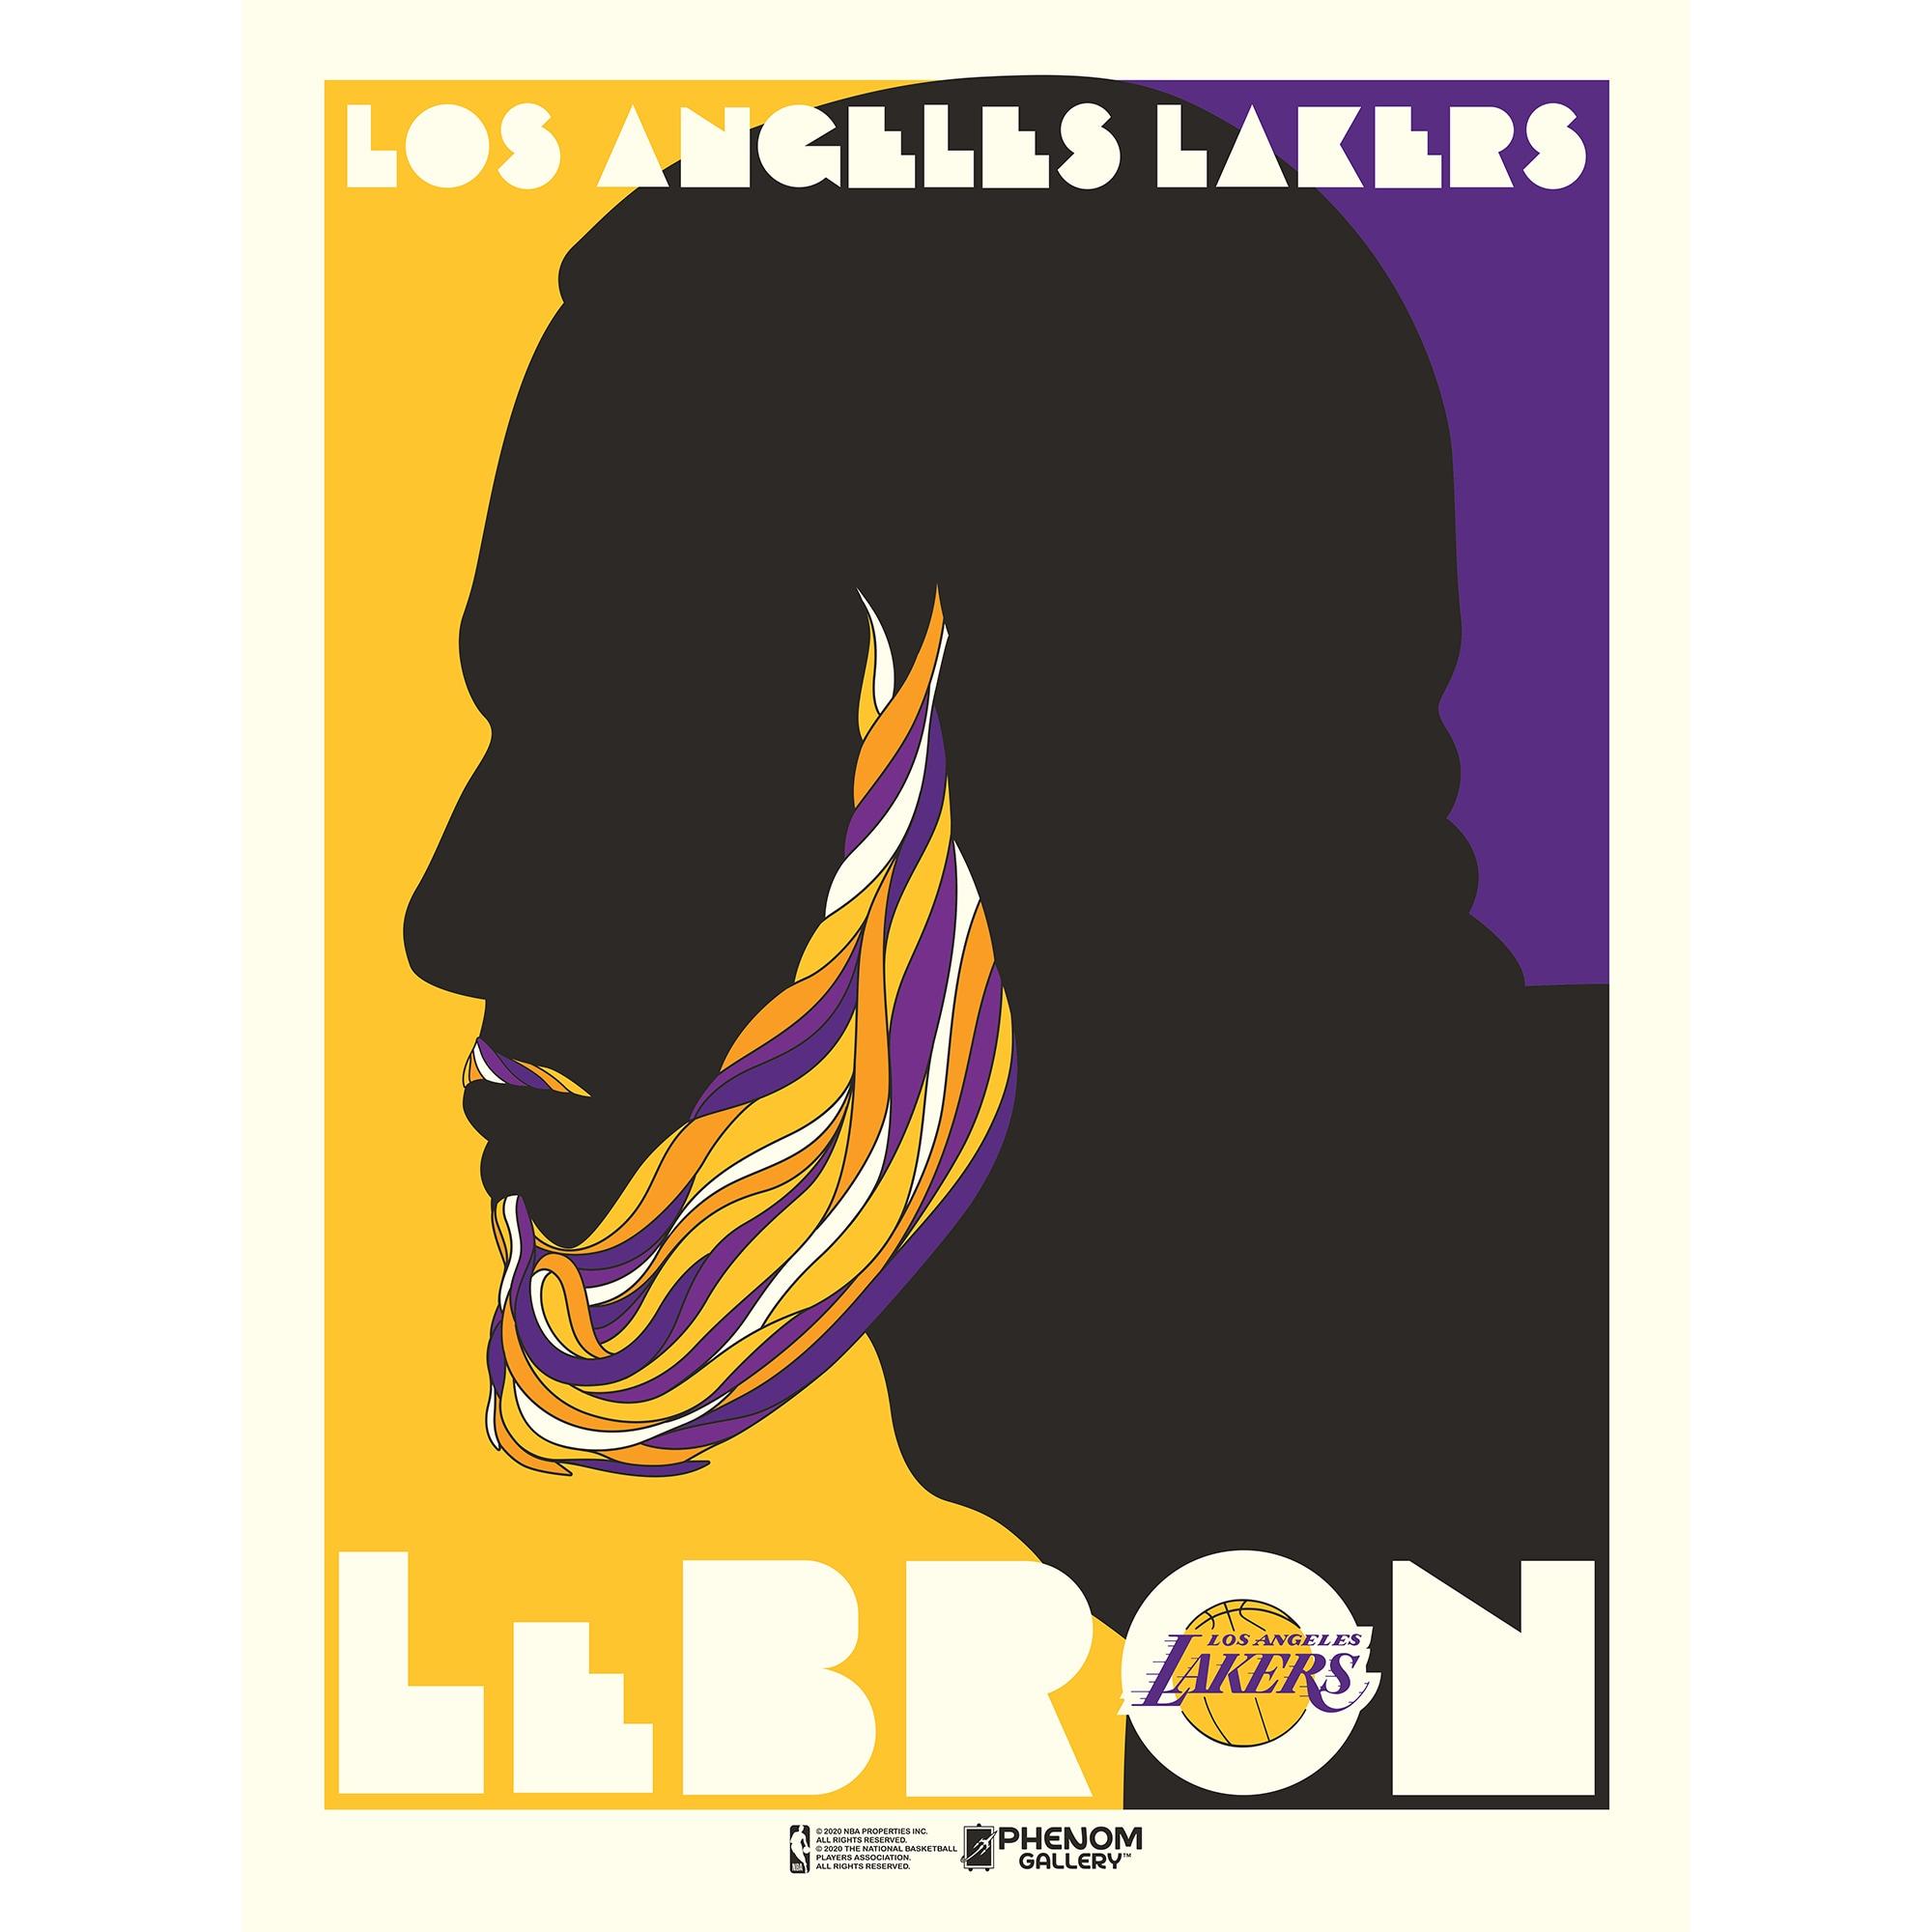 LeBron James Los Angeles Lakers 18'' x 24'' Push Glass Serigraph